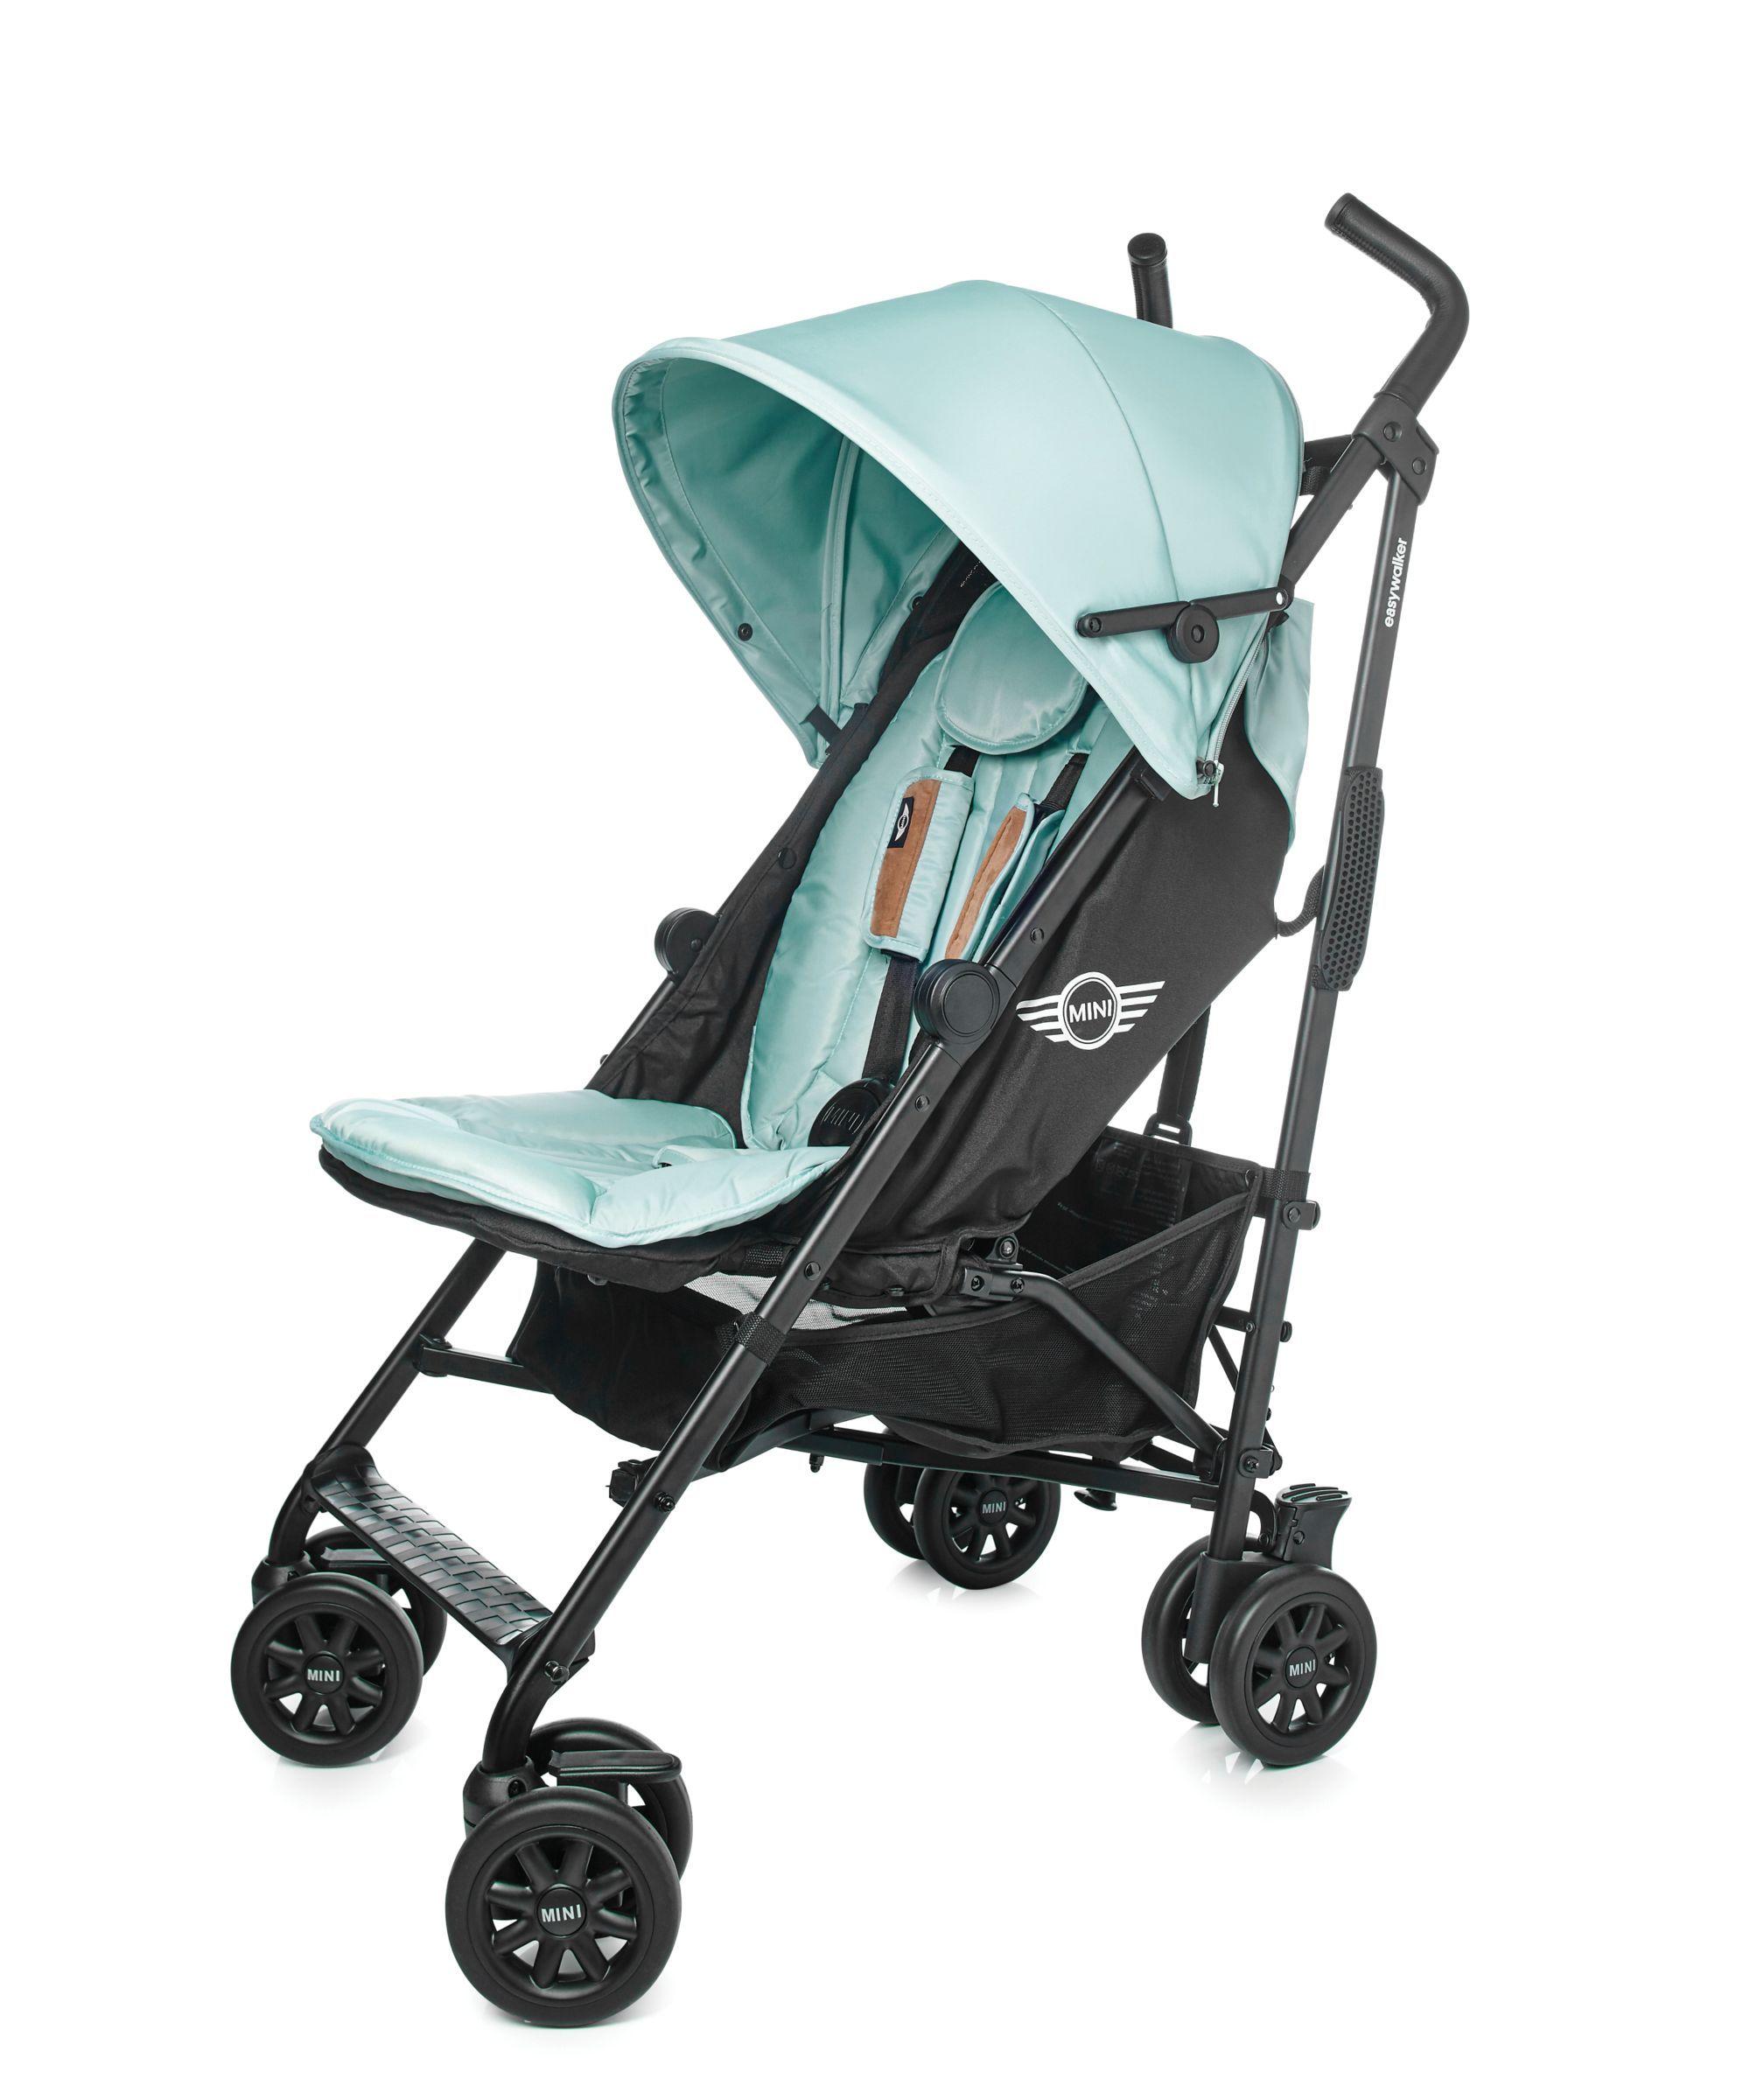 nursery bedding Baby strollers, Mini, Blue